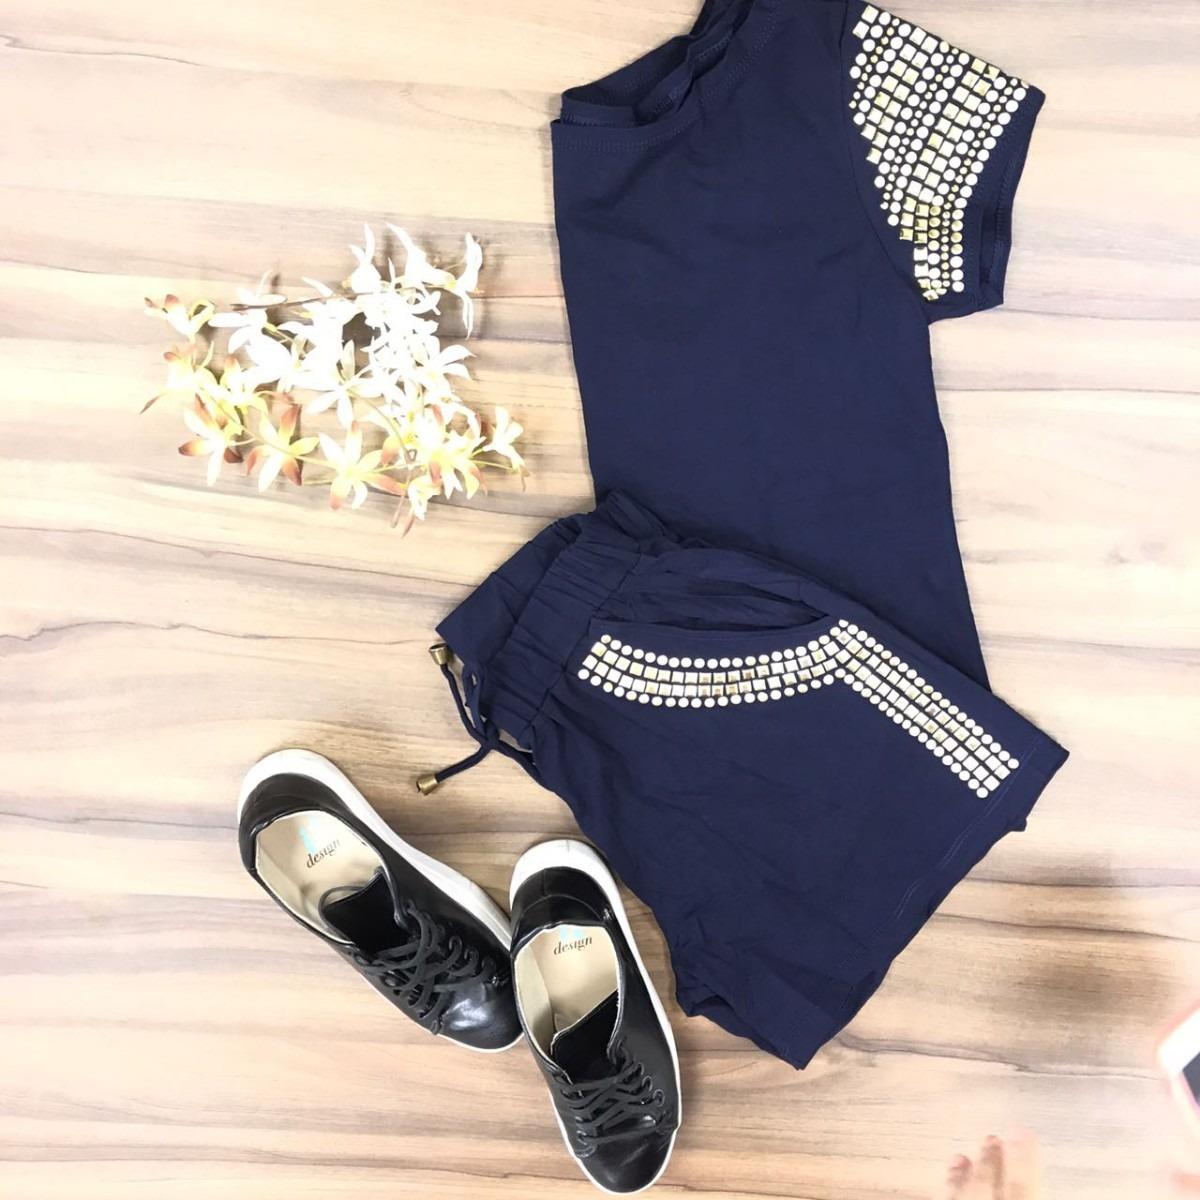 50db4faf42 conjunto blusa + shorts moda facebook moda feminina roupas. Carregando zoom.